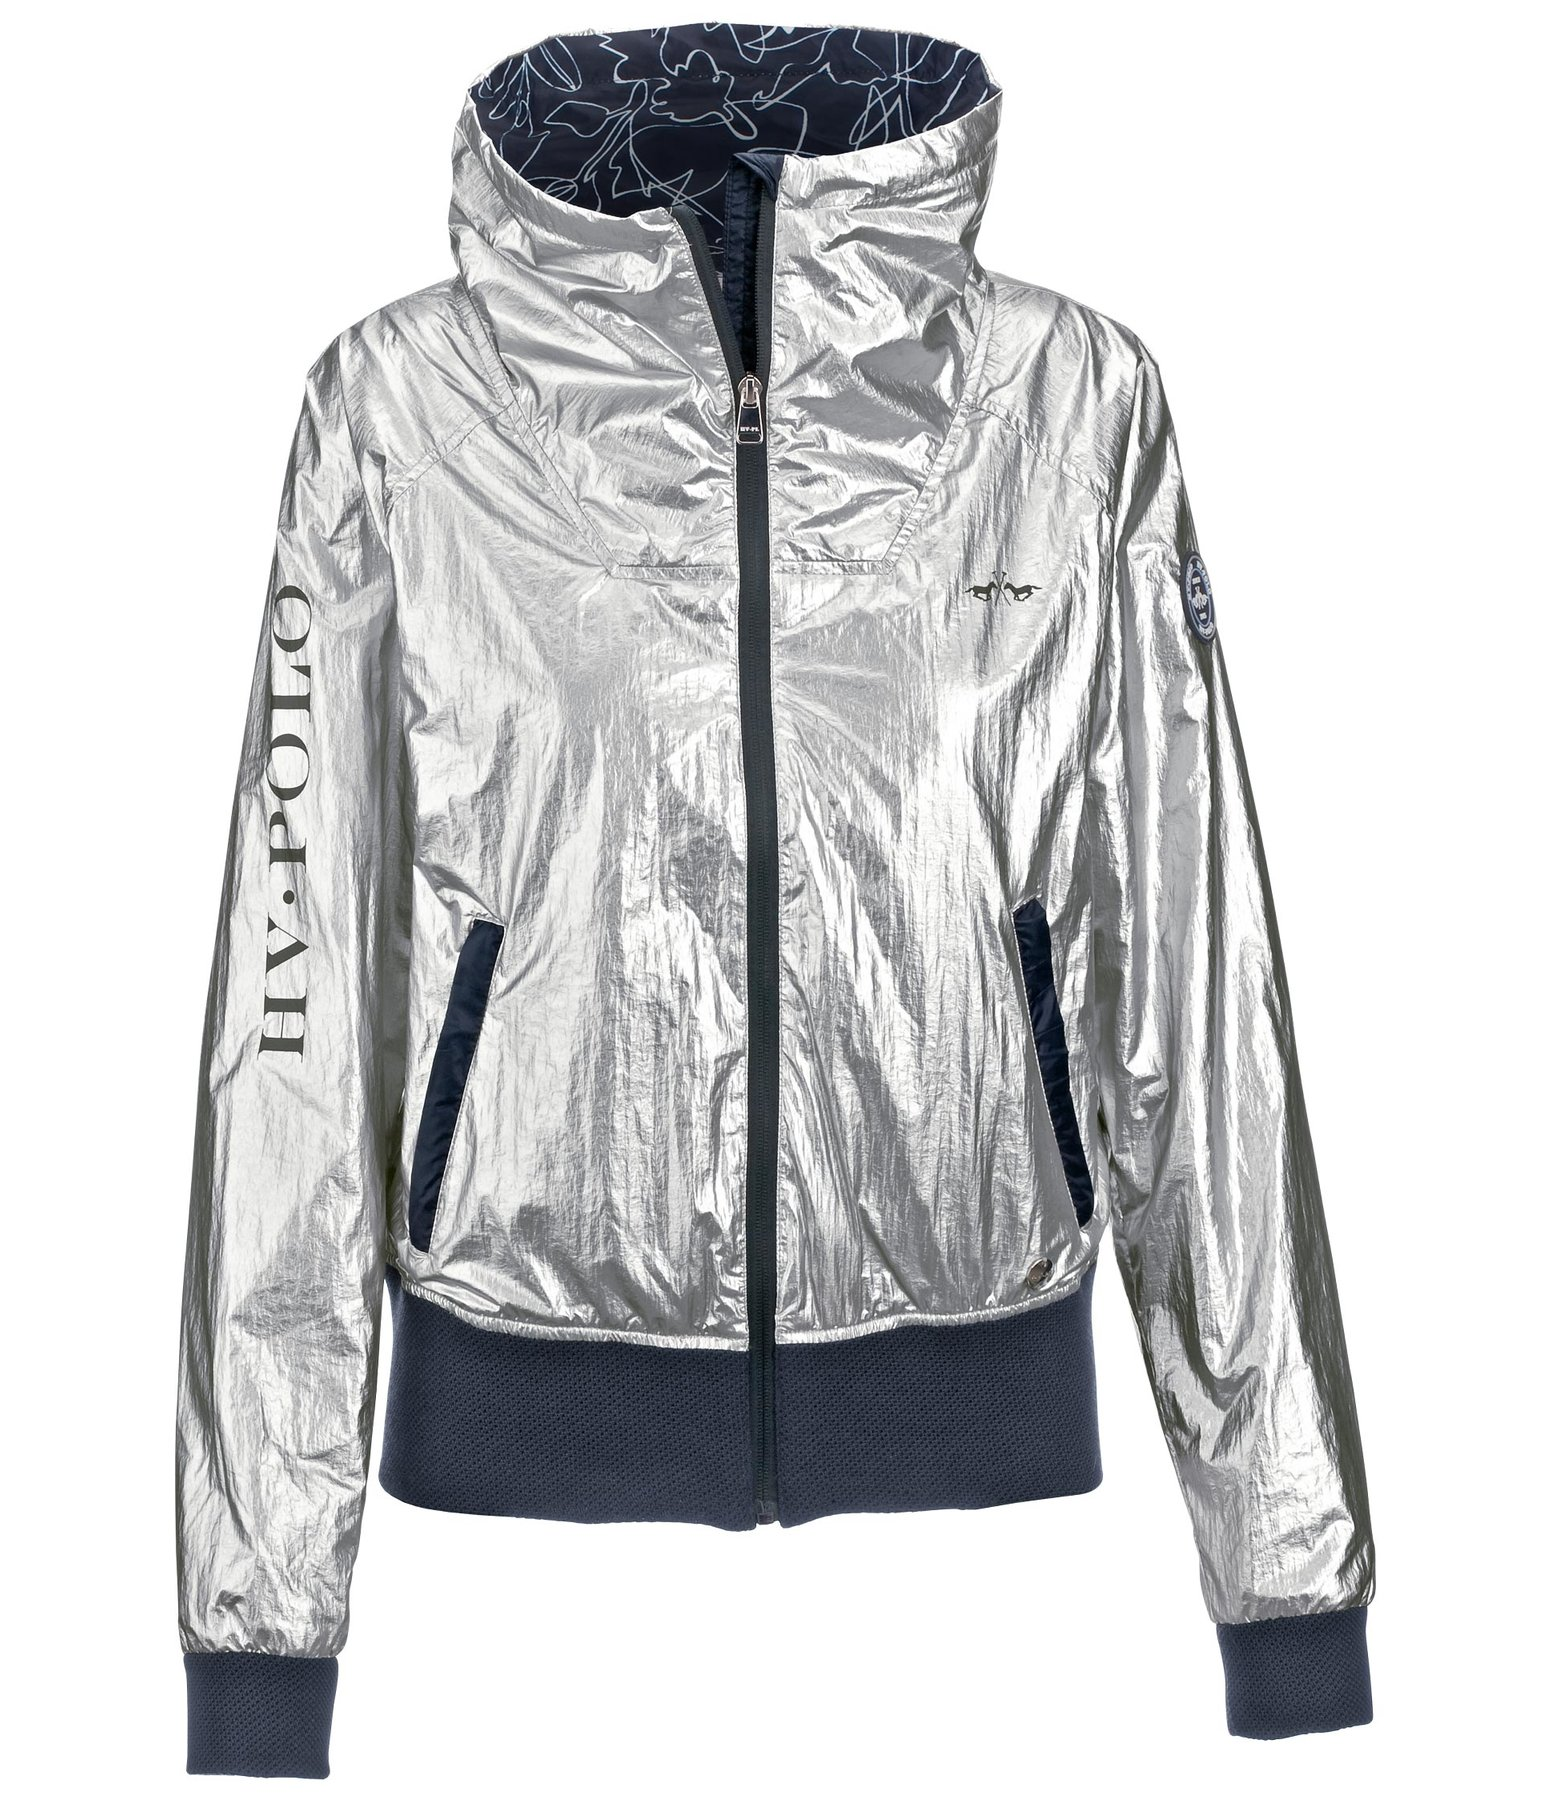 0cf1a4d9b936 Reversible Jacket Silver - Summer Jackets   Between-Seasons Jackets ...